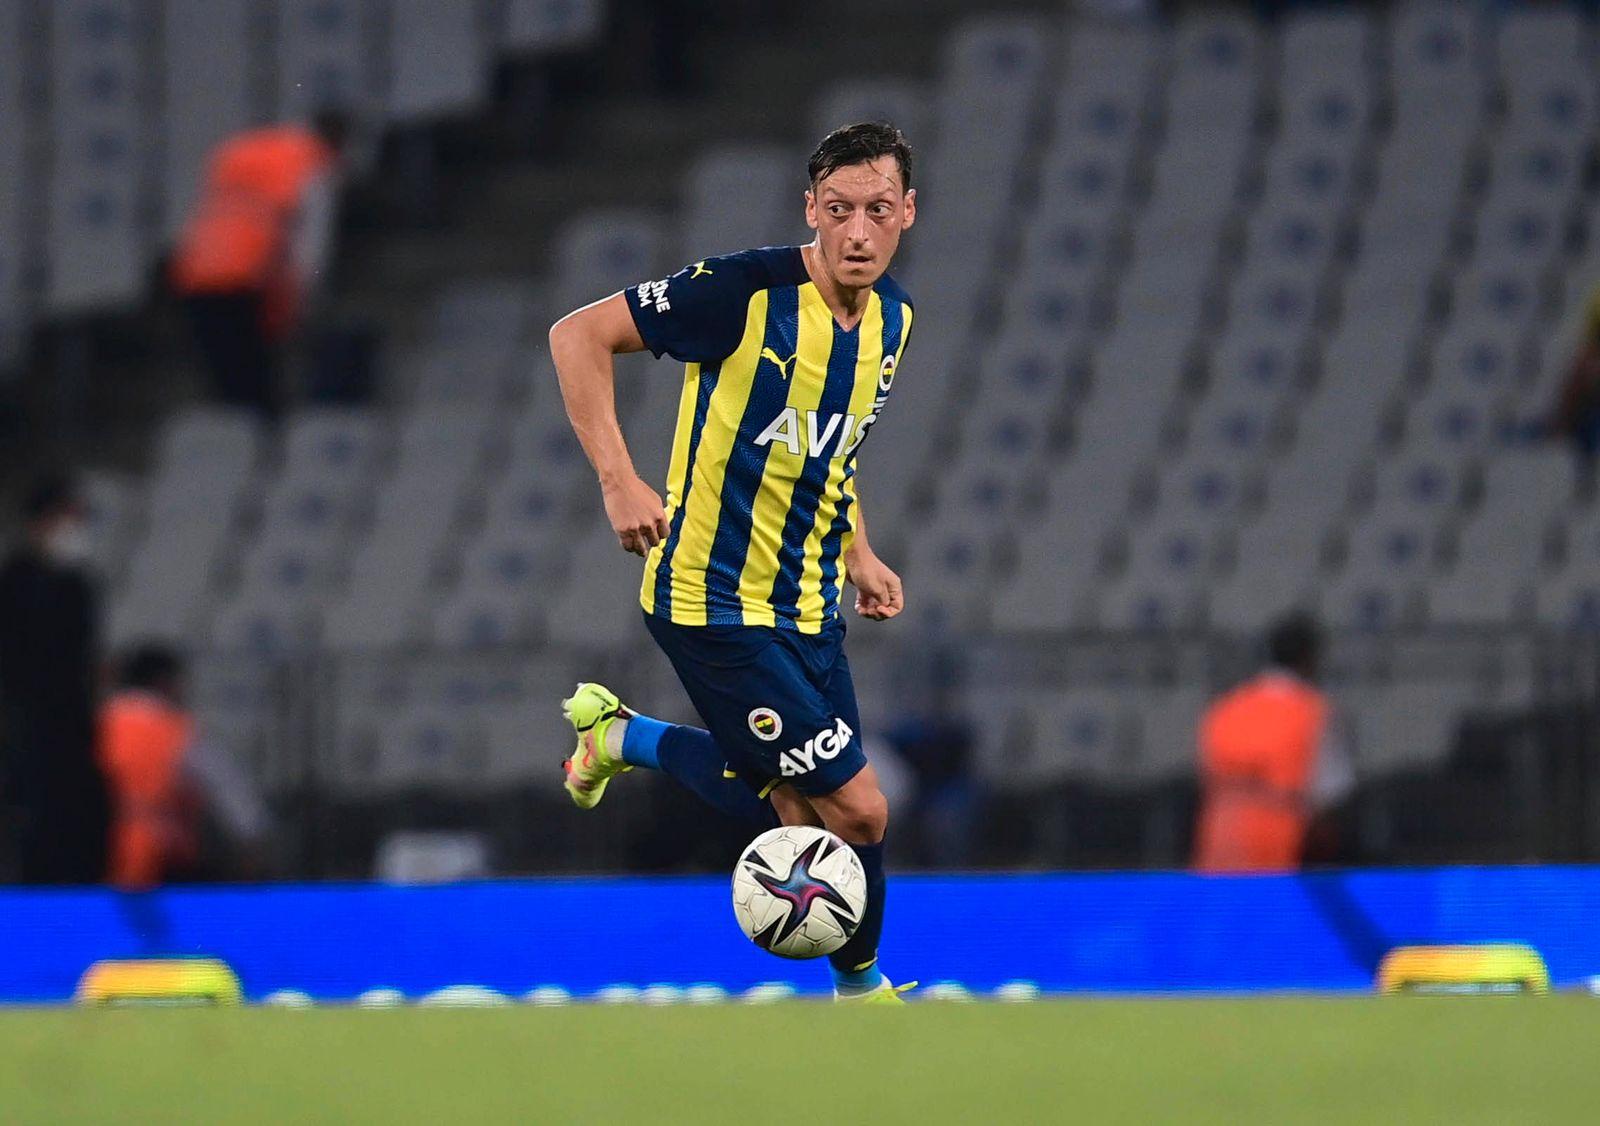 Mesut Ozil of Fenerbahce during the Friendly football match between Fenerbahce and Dynamo Kiev at Ataturk Olympic Stadiu